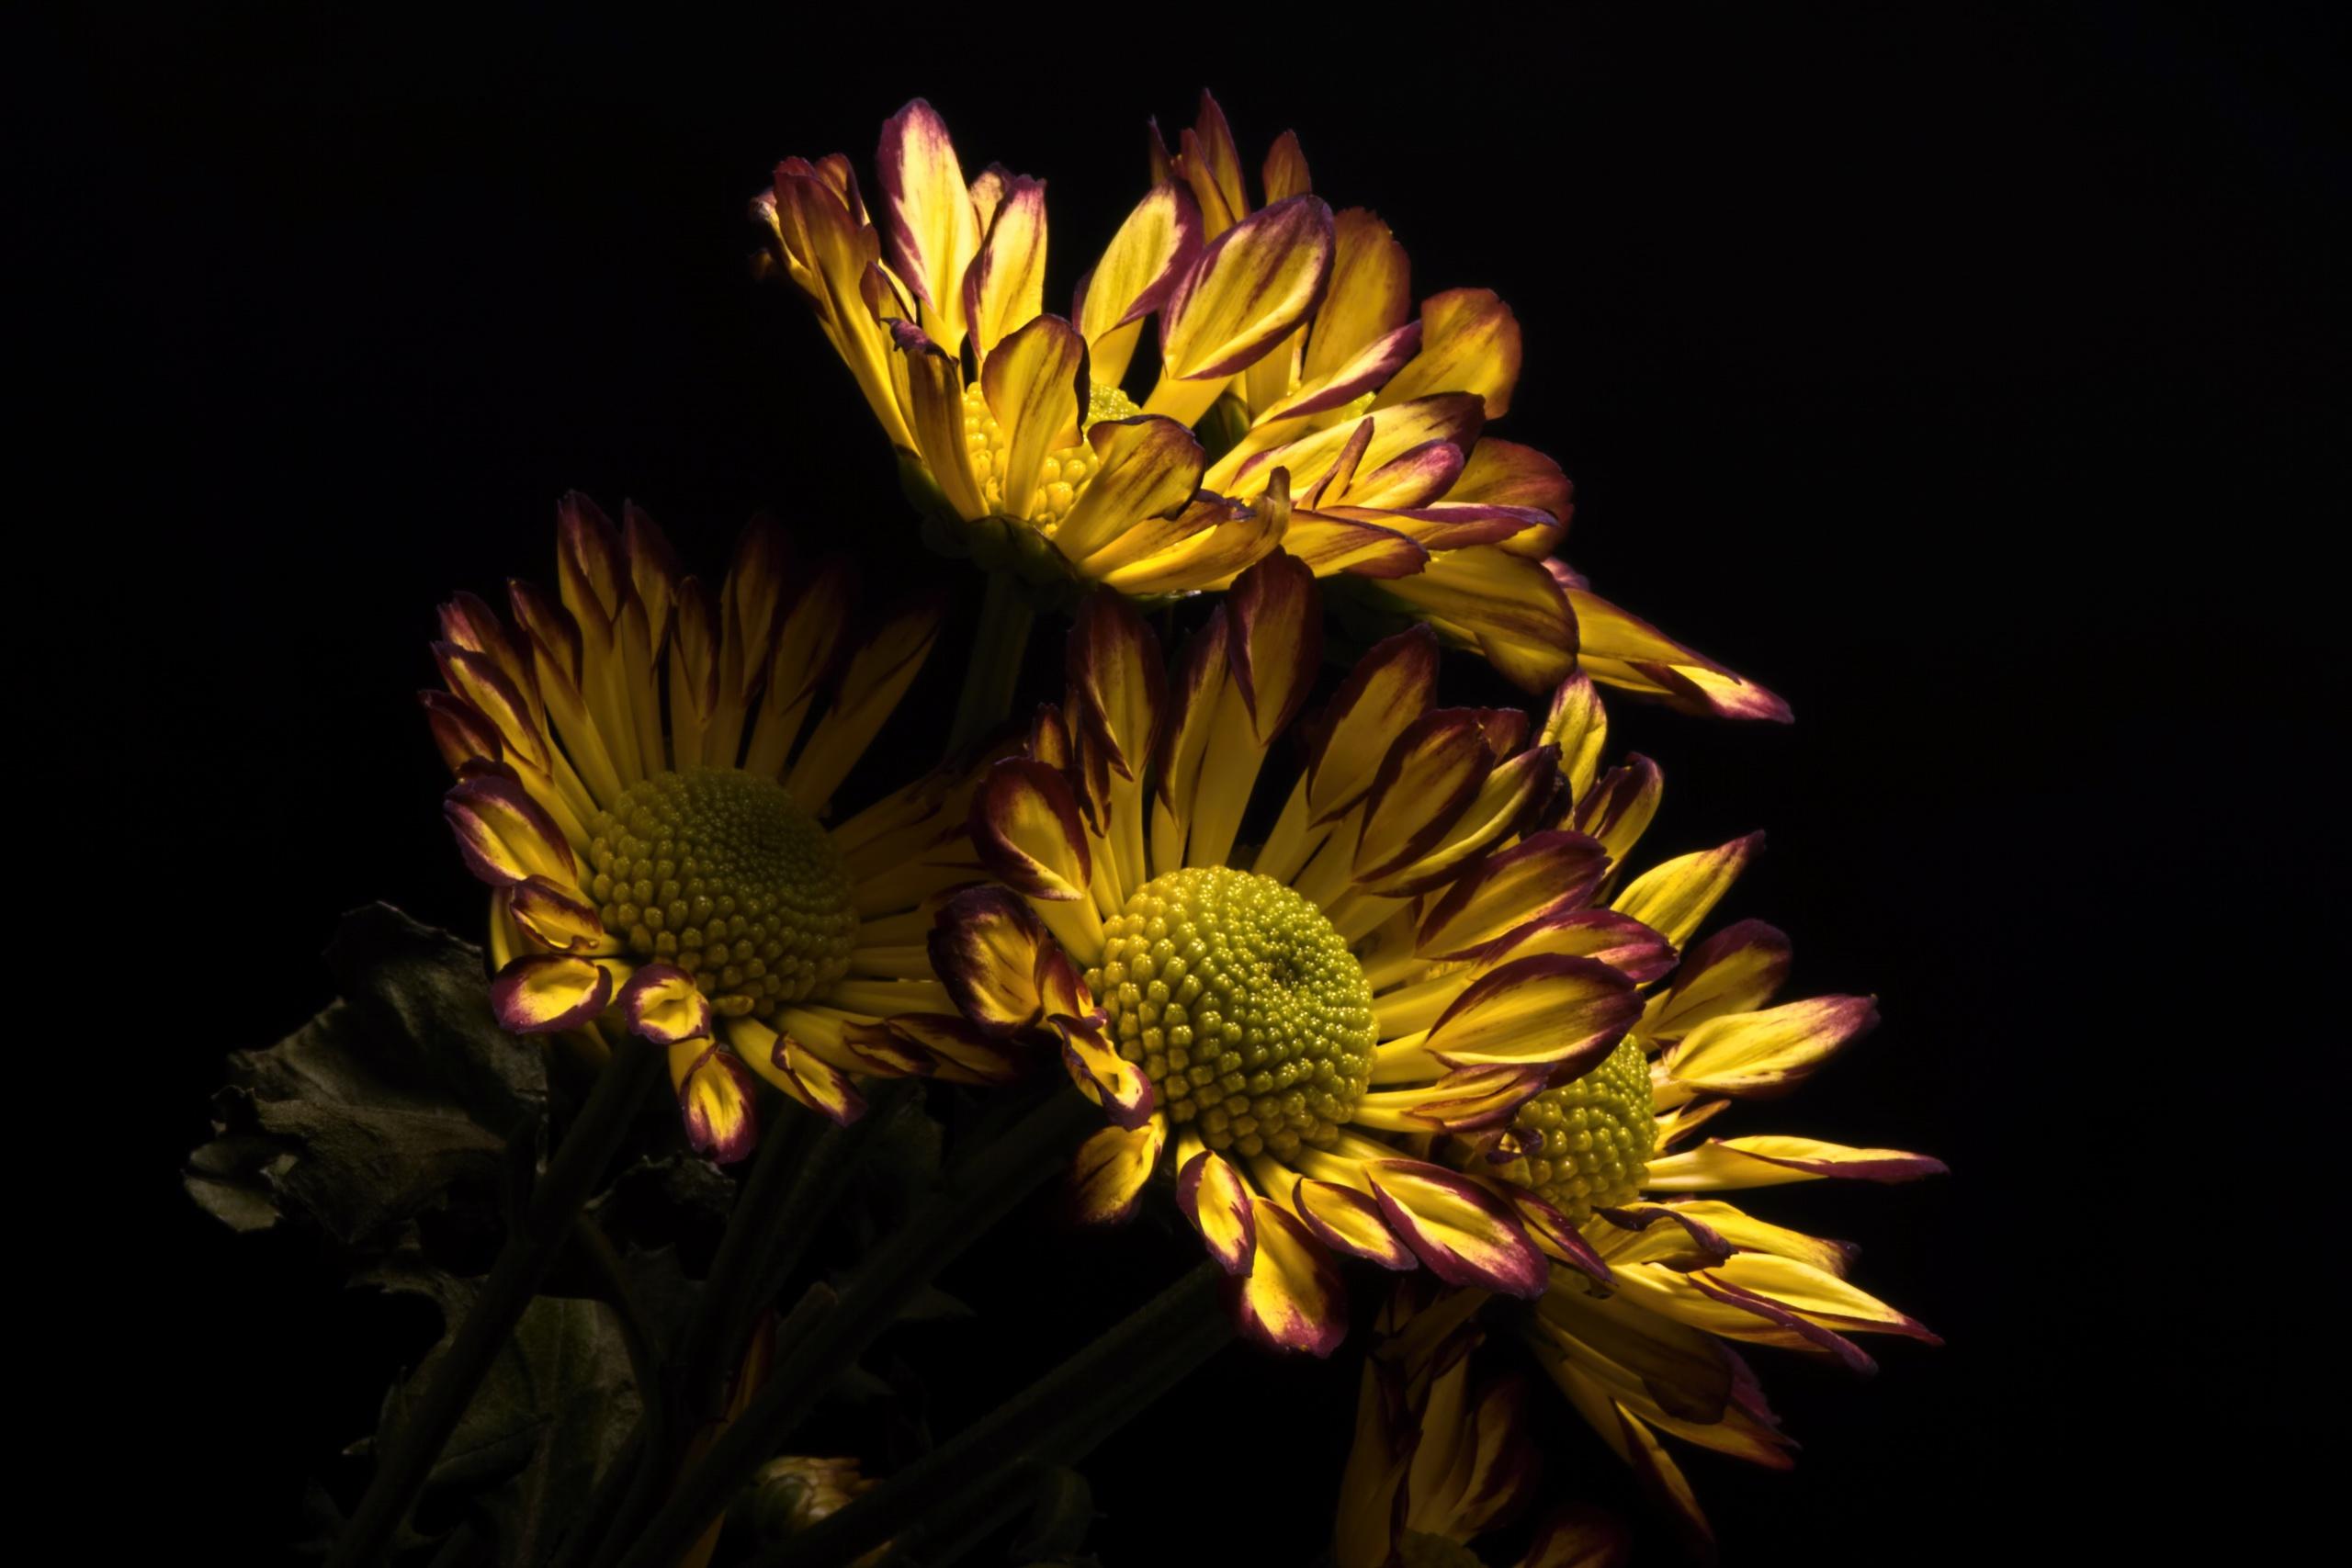 Wallpaper dark yellow flowers plants 2560x1707 wallpapermaniac dark yellow flowers plants flowers mightylinksfo